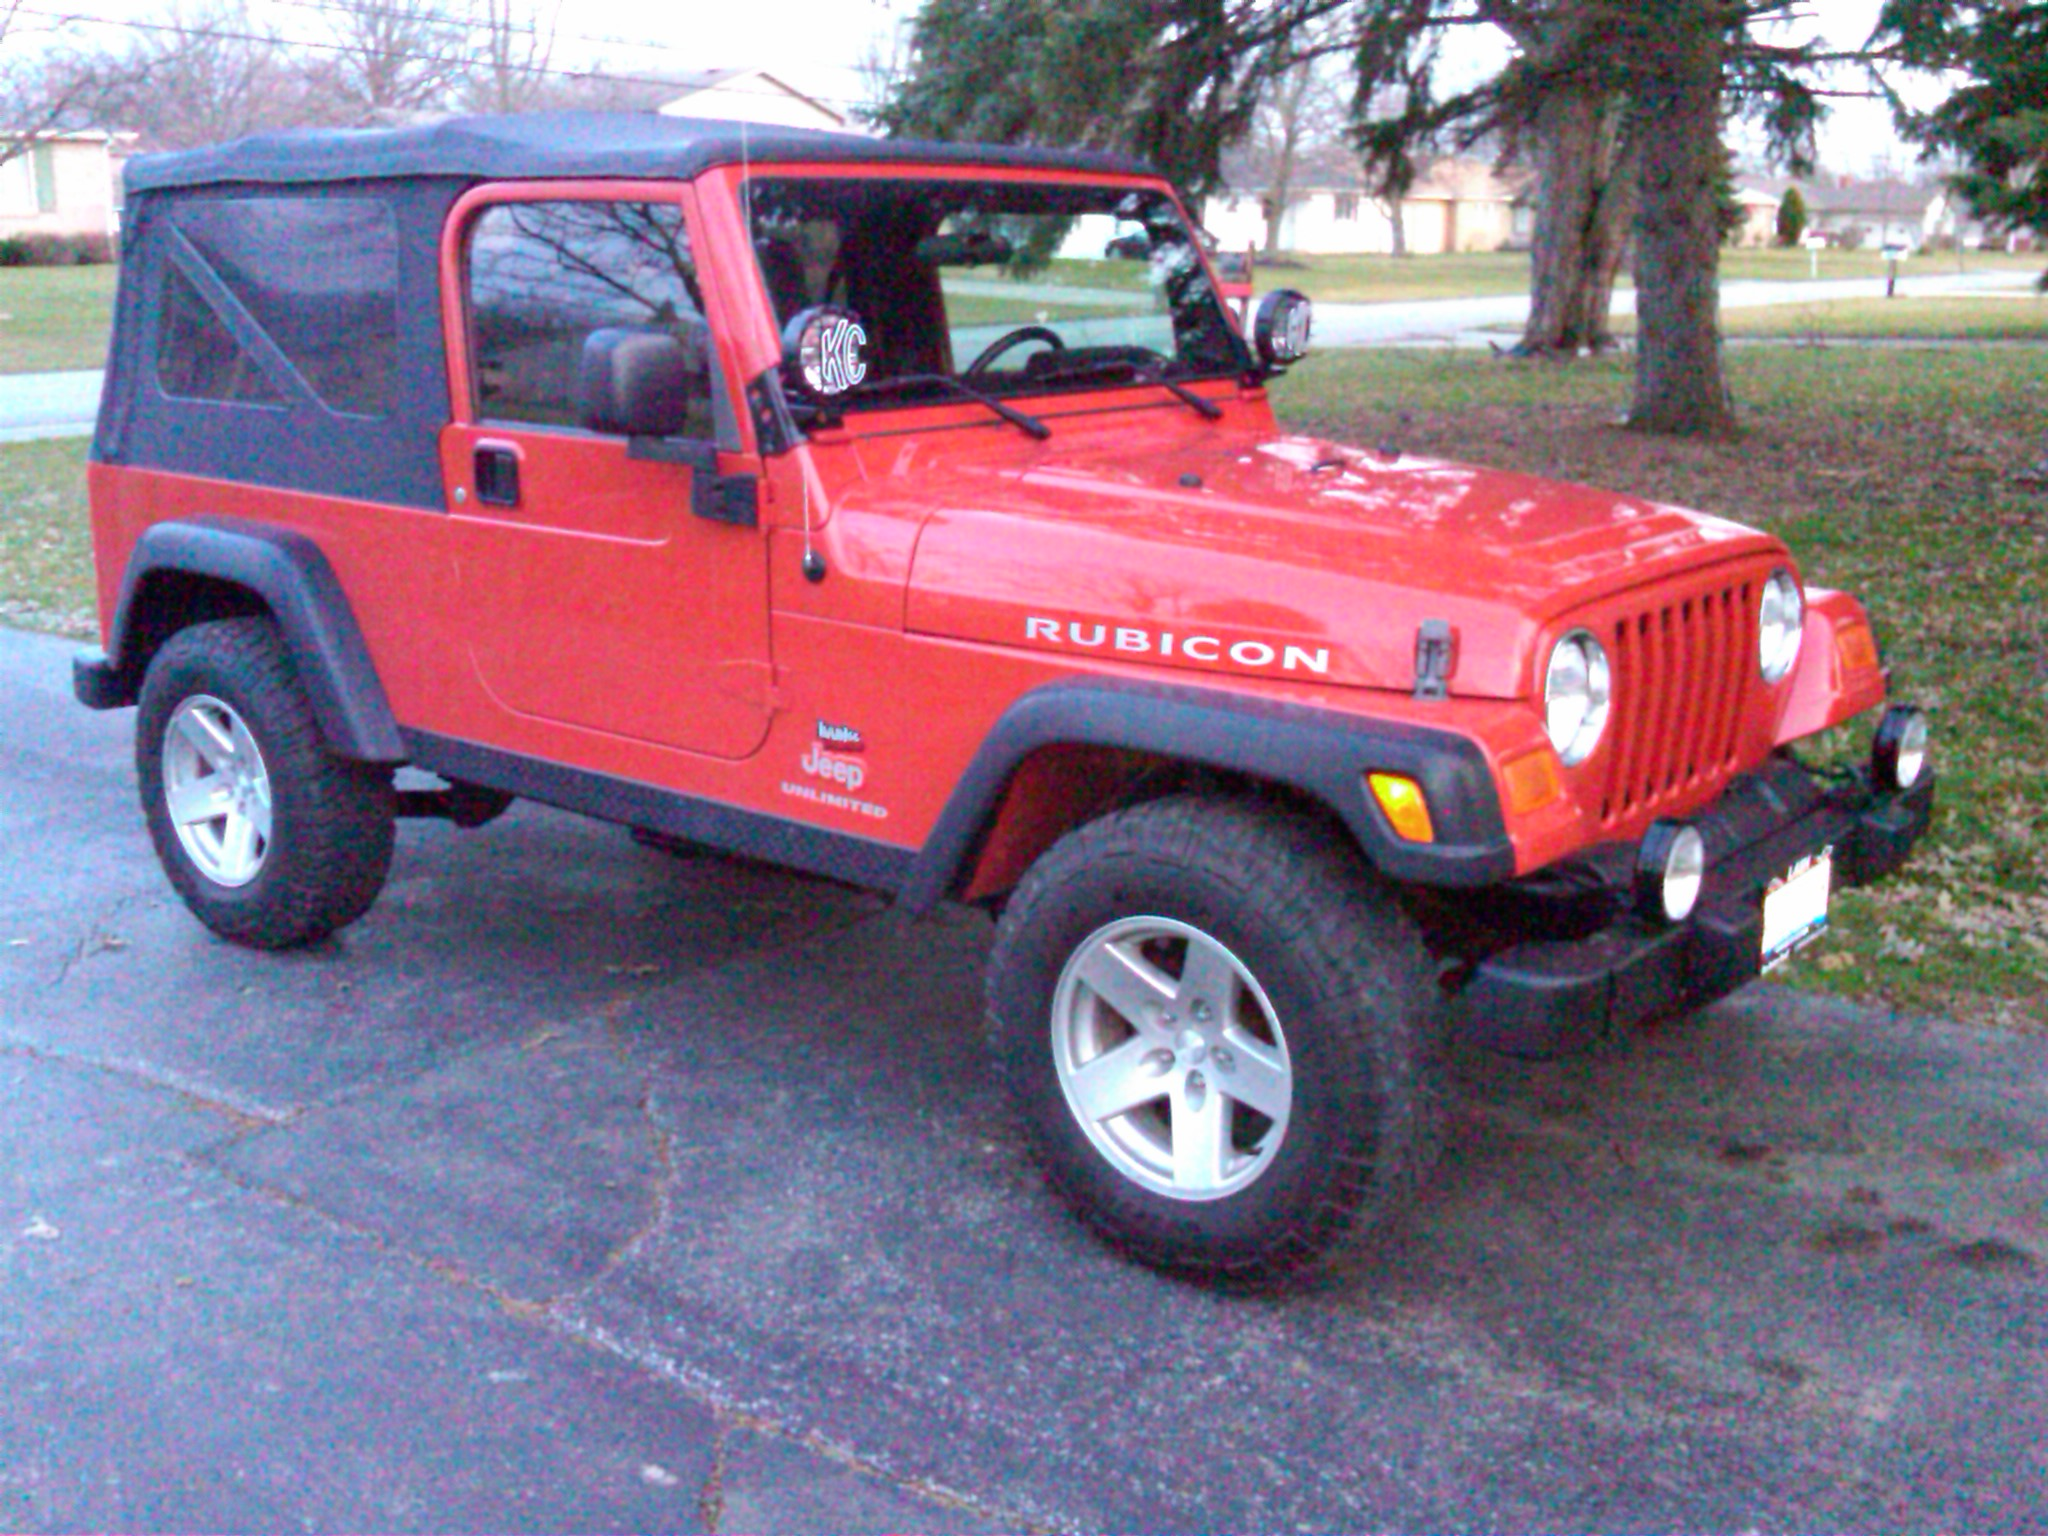 2005 jeep wrangler lj hardtop for sale - Re Jeep Wrangler Lj Unlimited Production Numbers